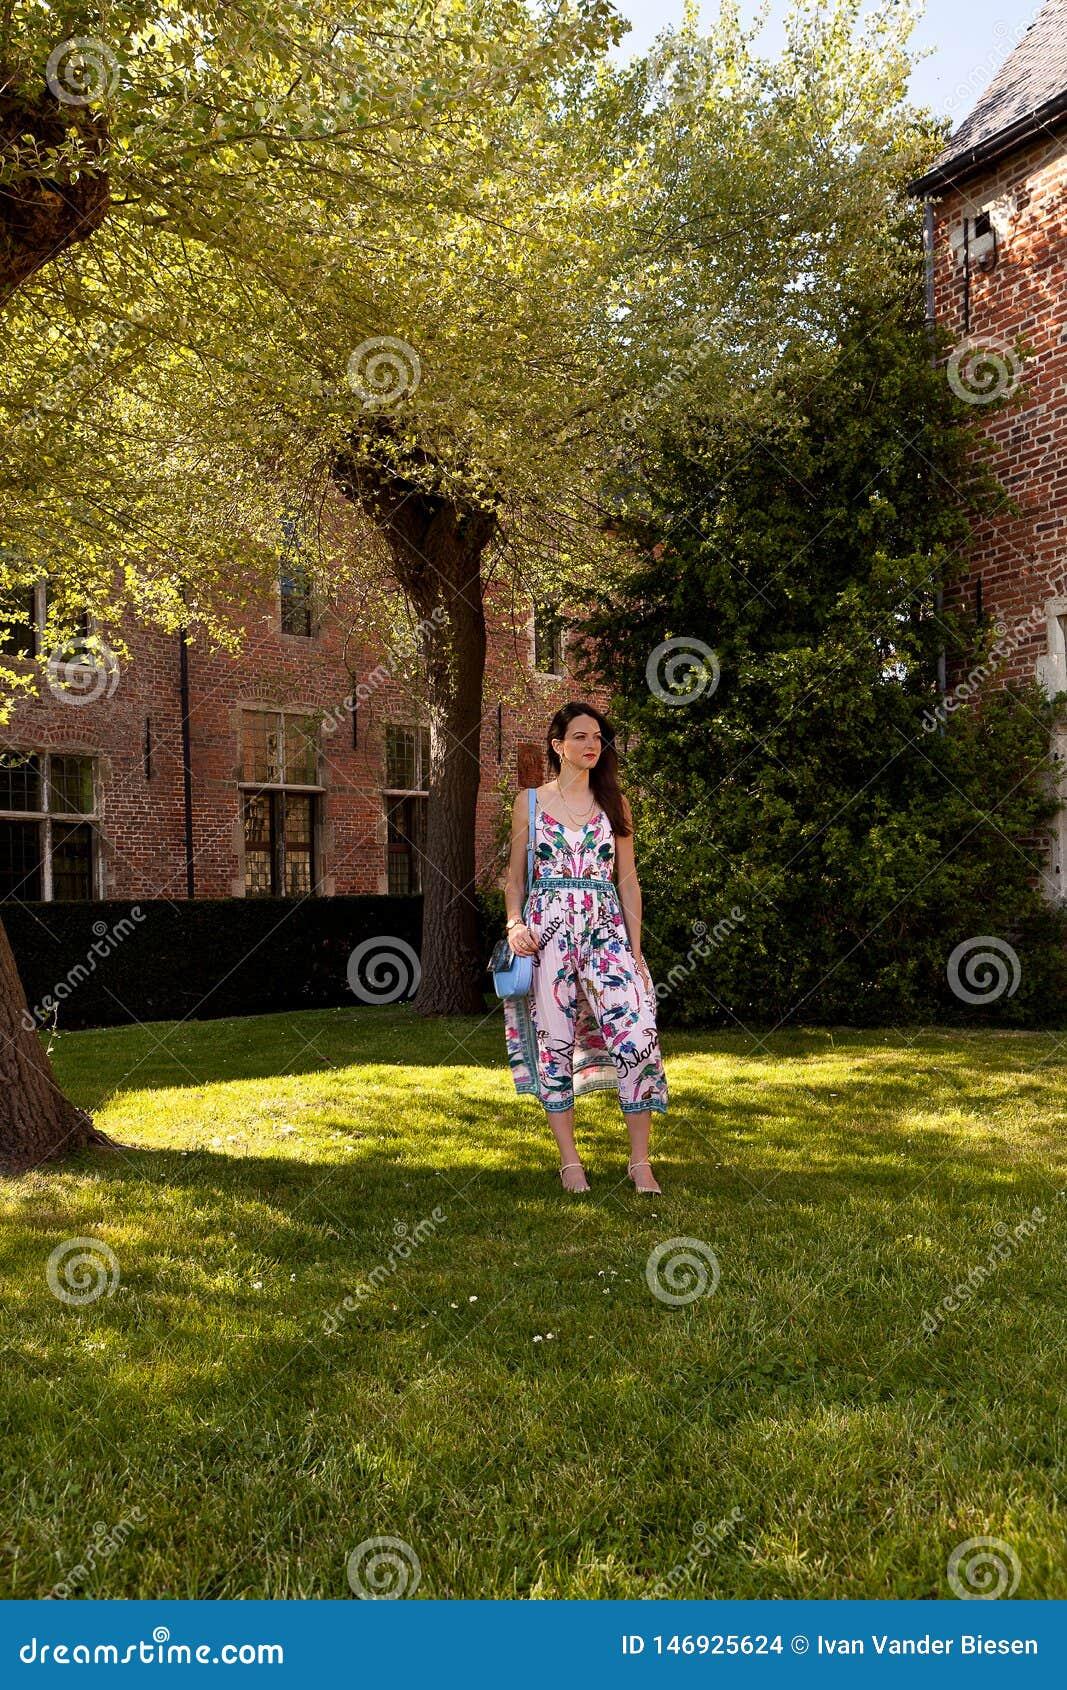 Relaxed woman standing grass tree, Groot Begijnhof, Leuven, Belgium